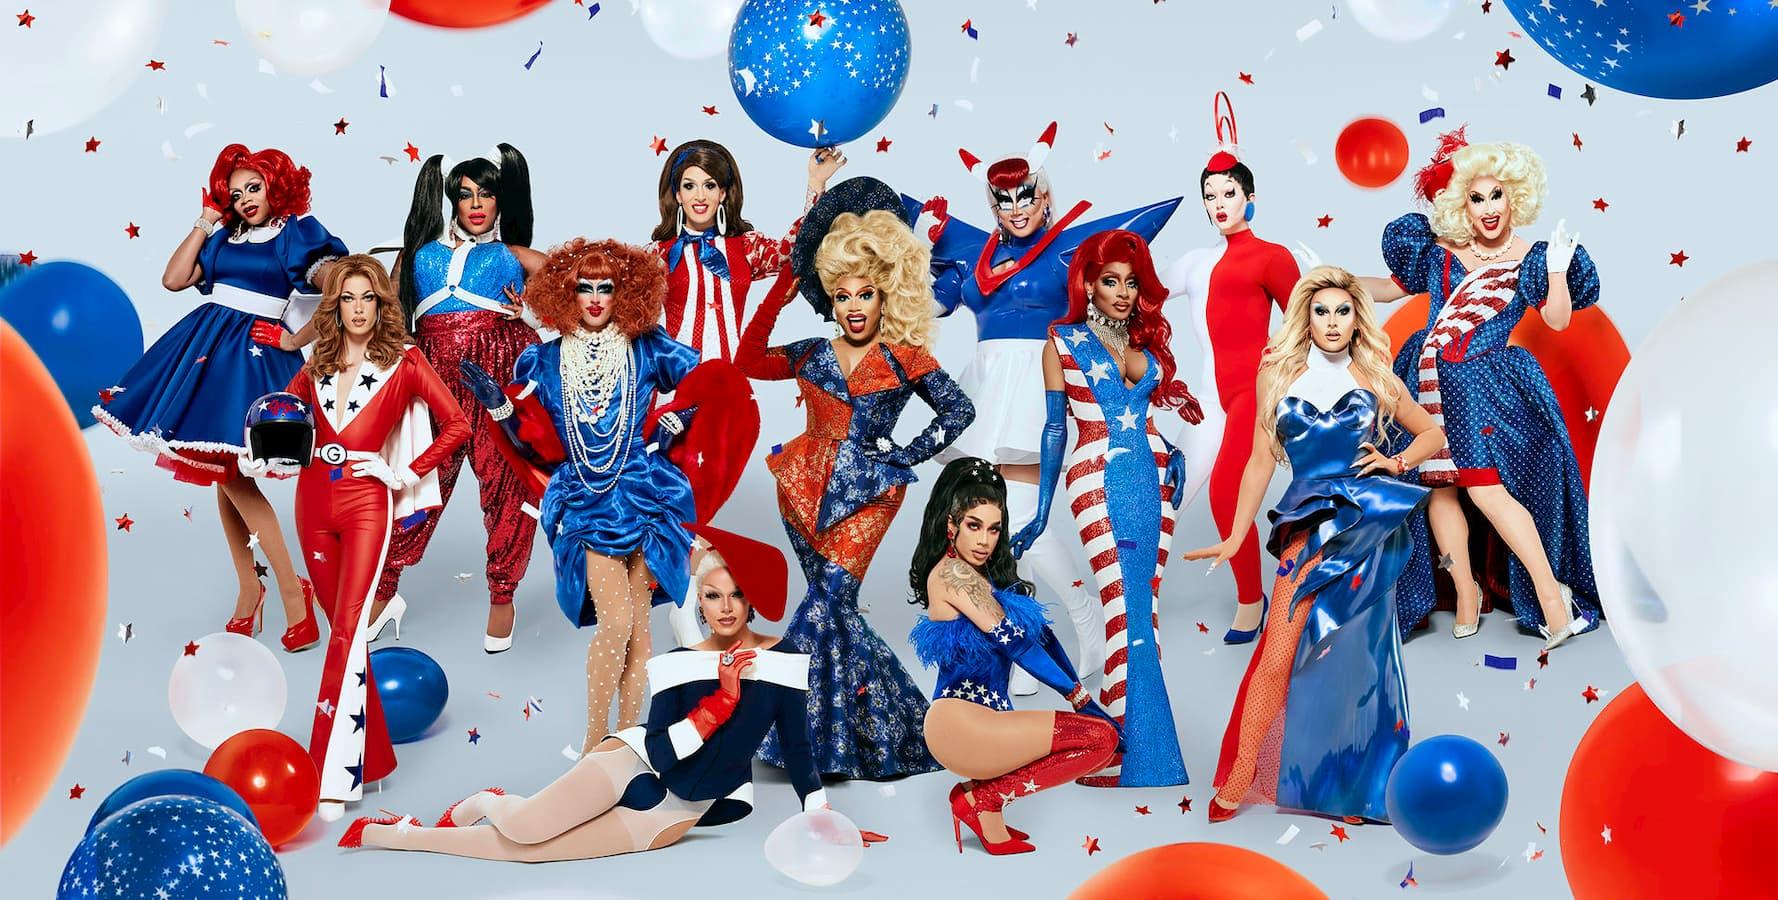 Material promocional de RuPaul's Drag Race: Temporada 12